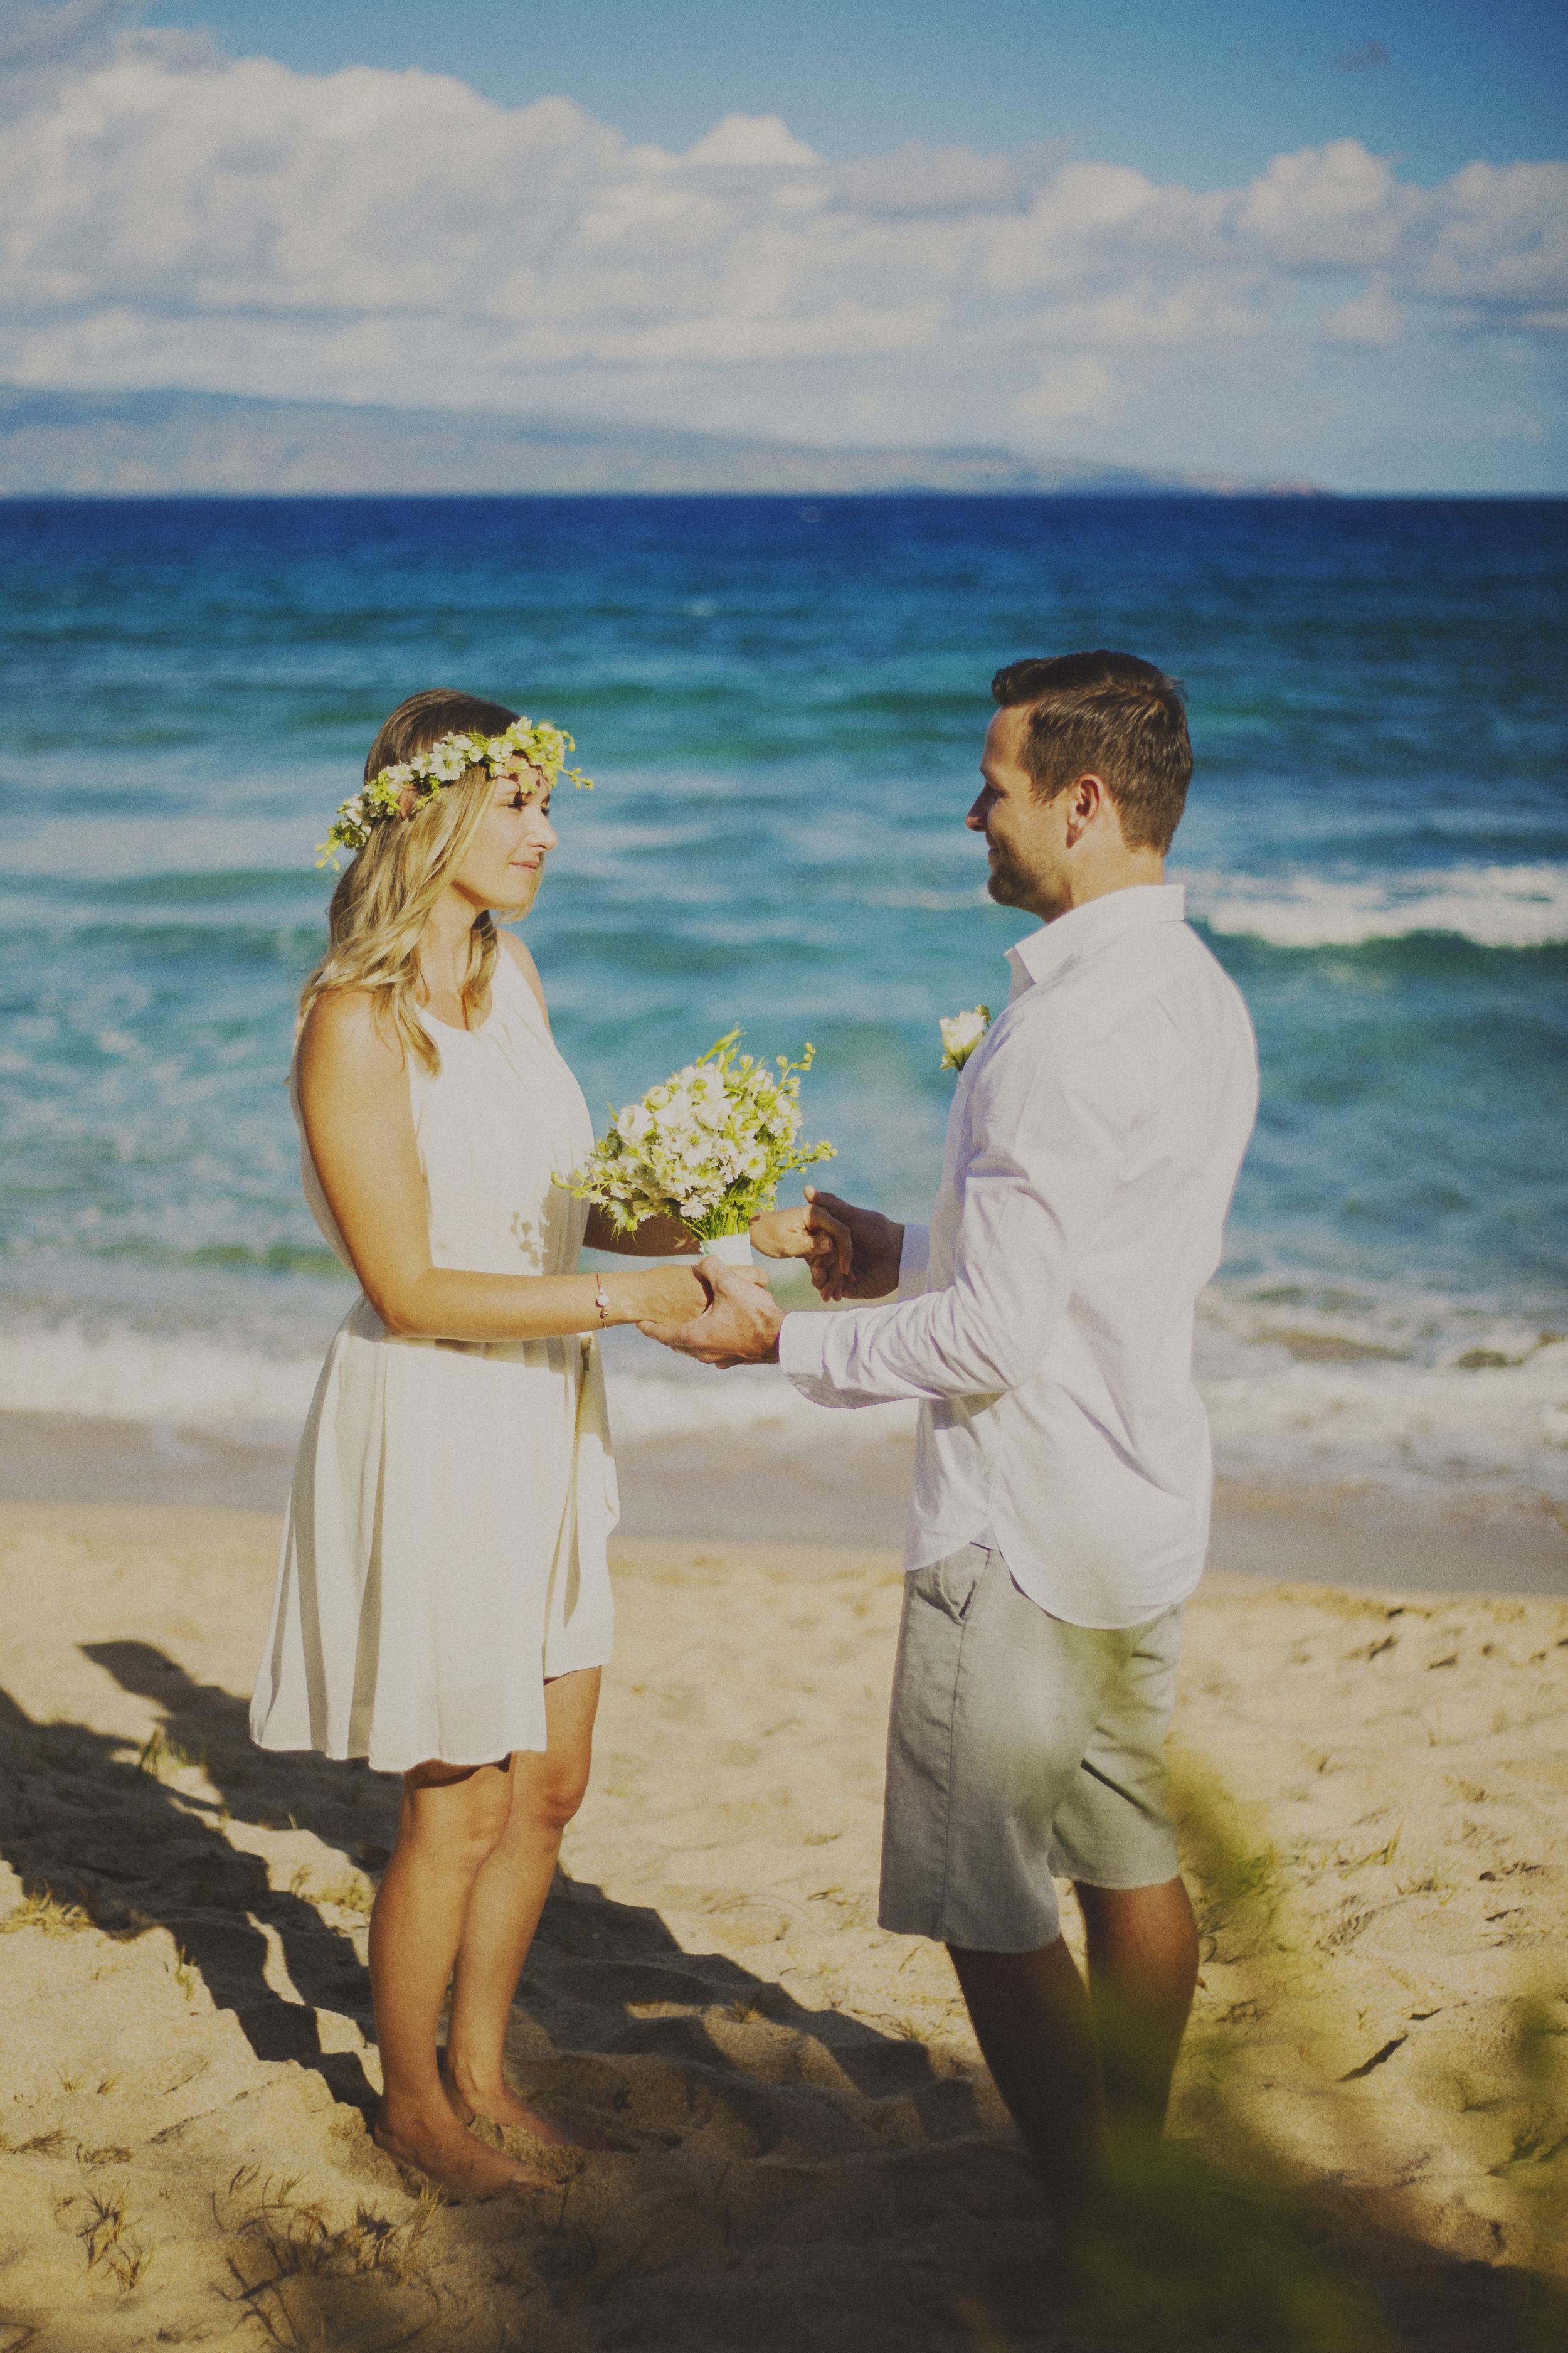 angie-diaz-photography-maui-elopement-oneloa-ironwoods-beach-6.jpg